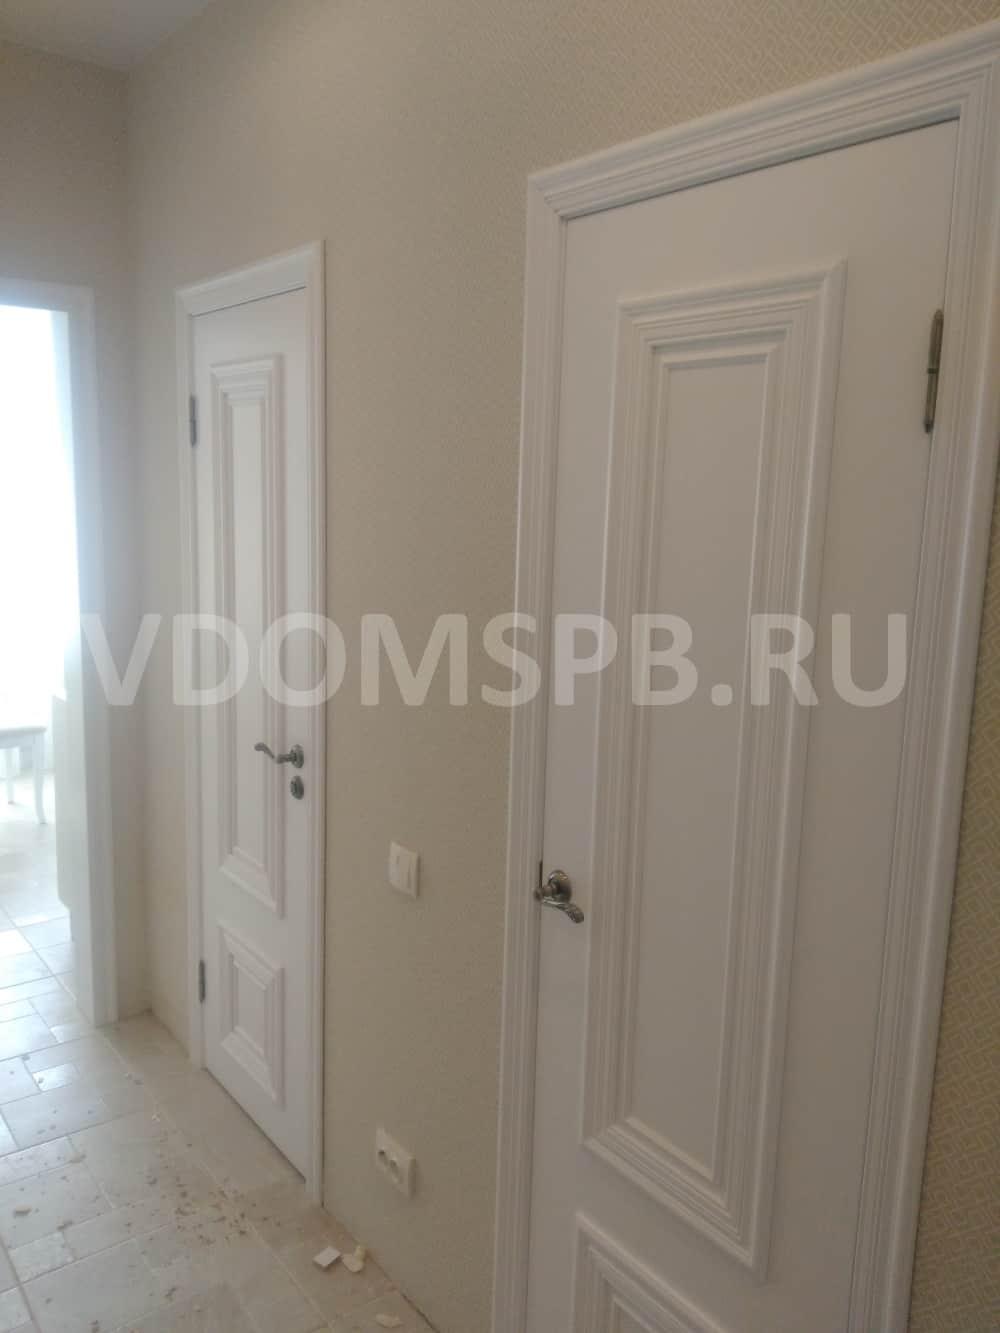 Белые двери с широким штапиком